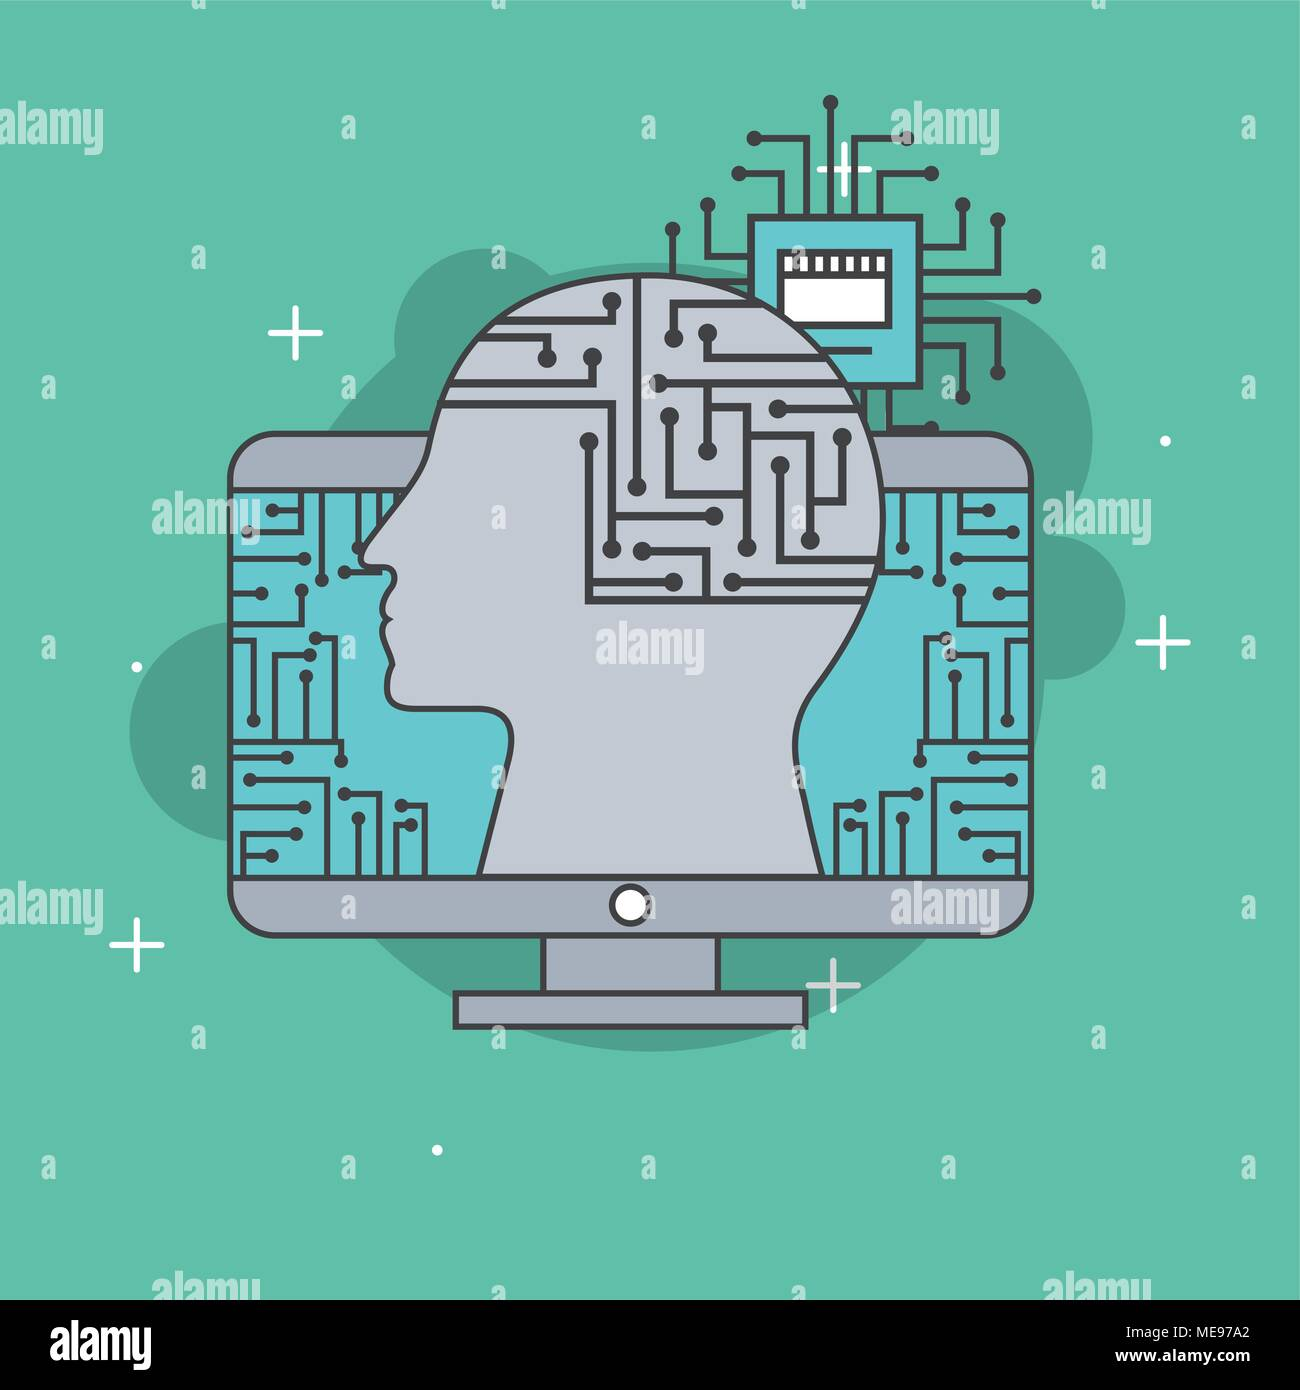 Computer Circuit Board Human Face Stock Photos & Computer Circuit ...